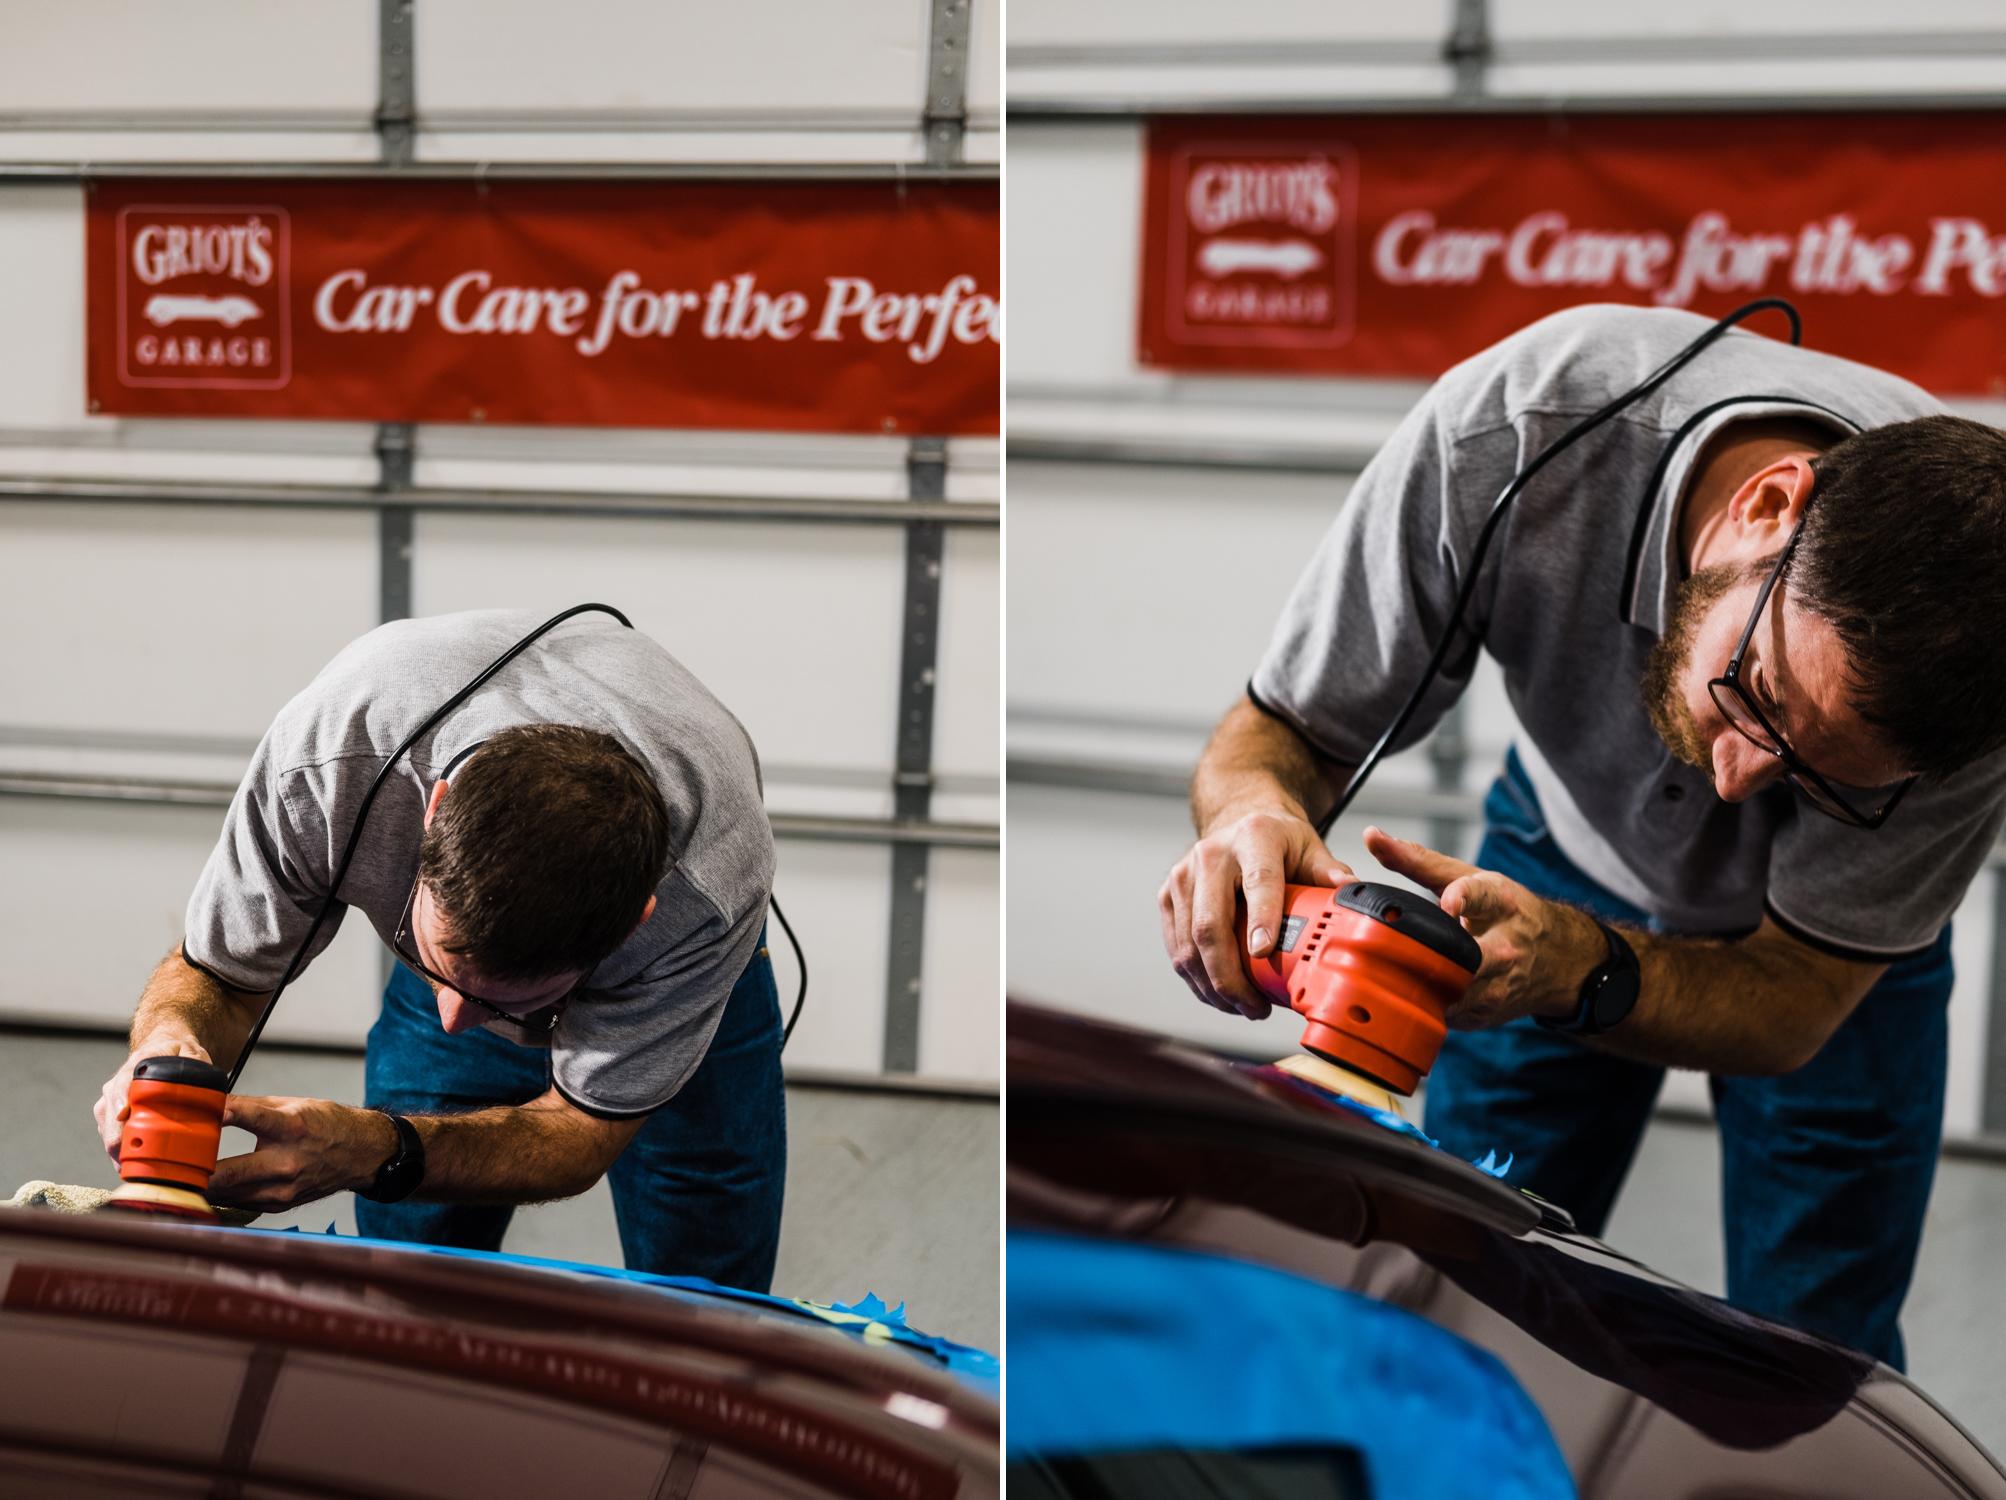 Porsche 911 Carrera 4S-Porsche 993-Porsche 911-Paint Correction-Car Wash-Car Detailing-204.jpg